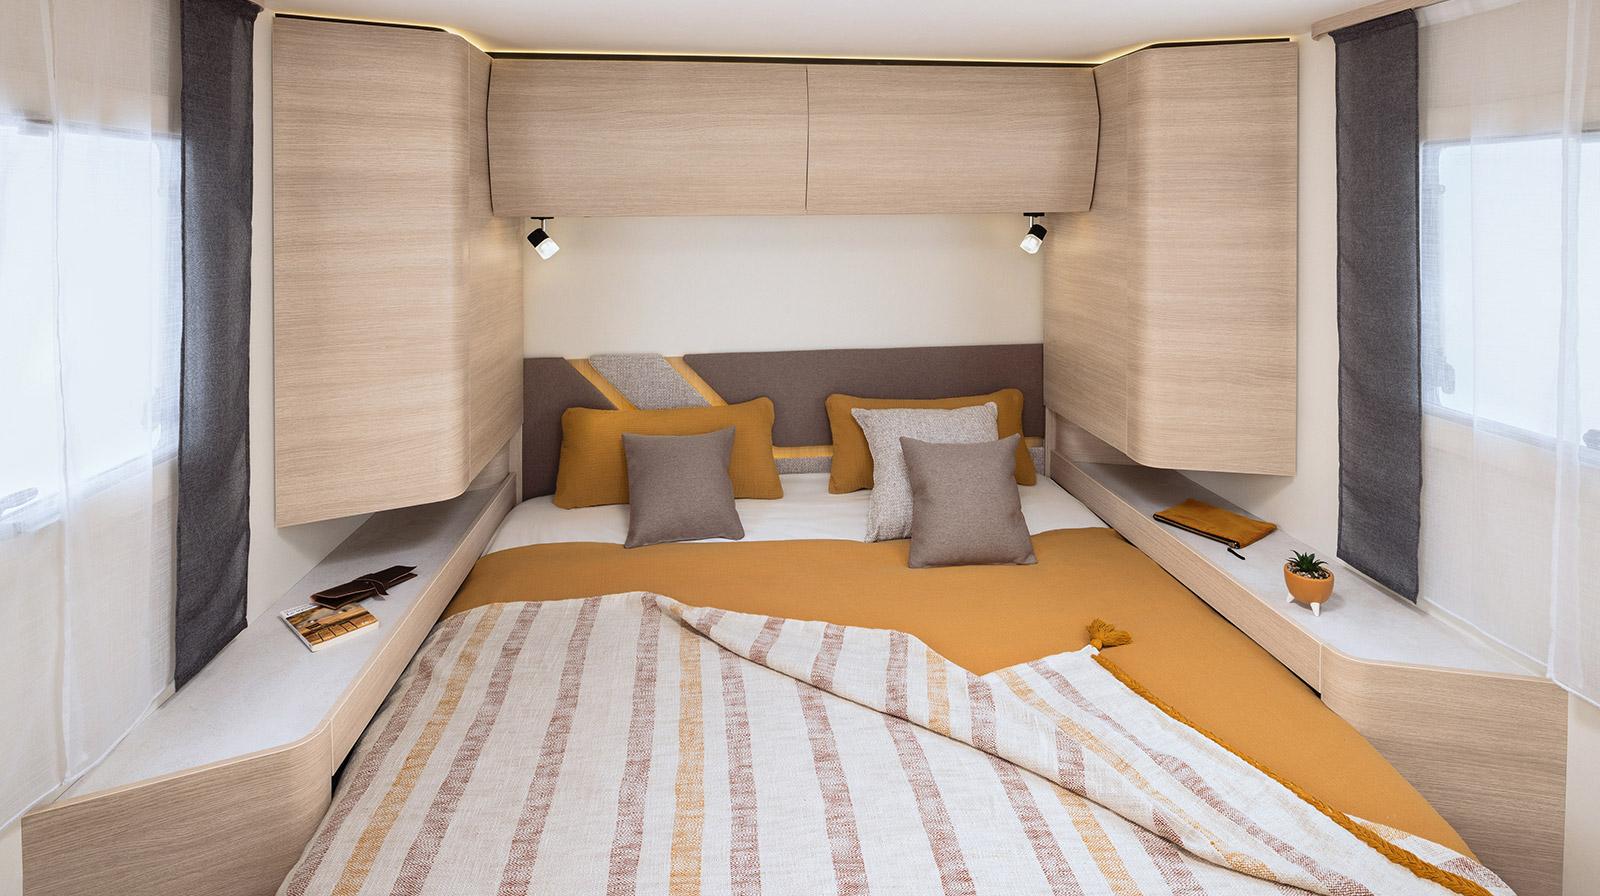 reisemobil rapido 696f teilintegrierte s rie 6f deutschland. Black Bedroom Furniture Sets. Home Design Ideas